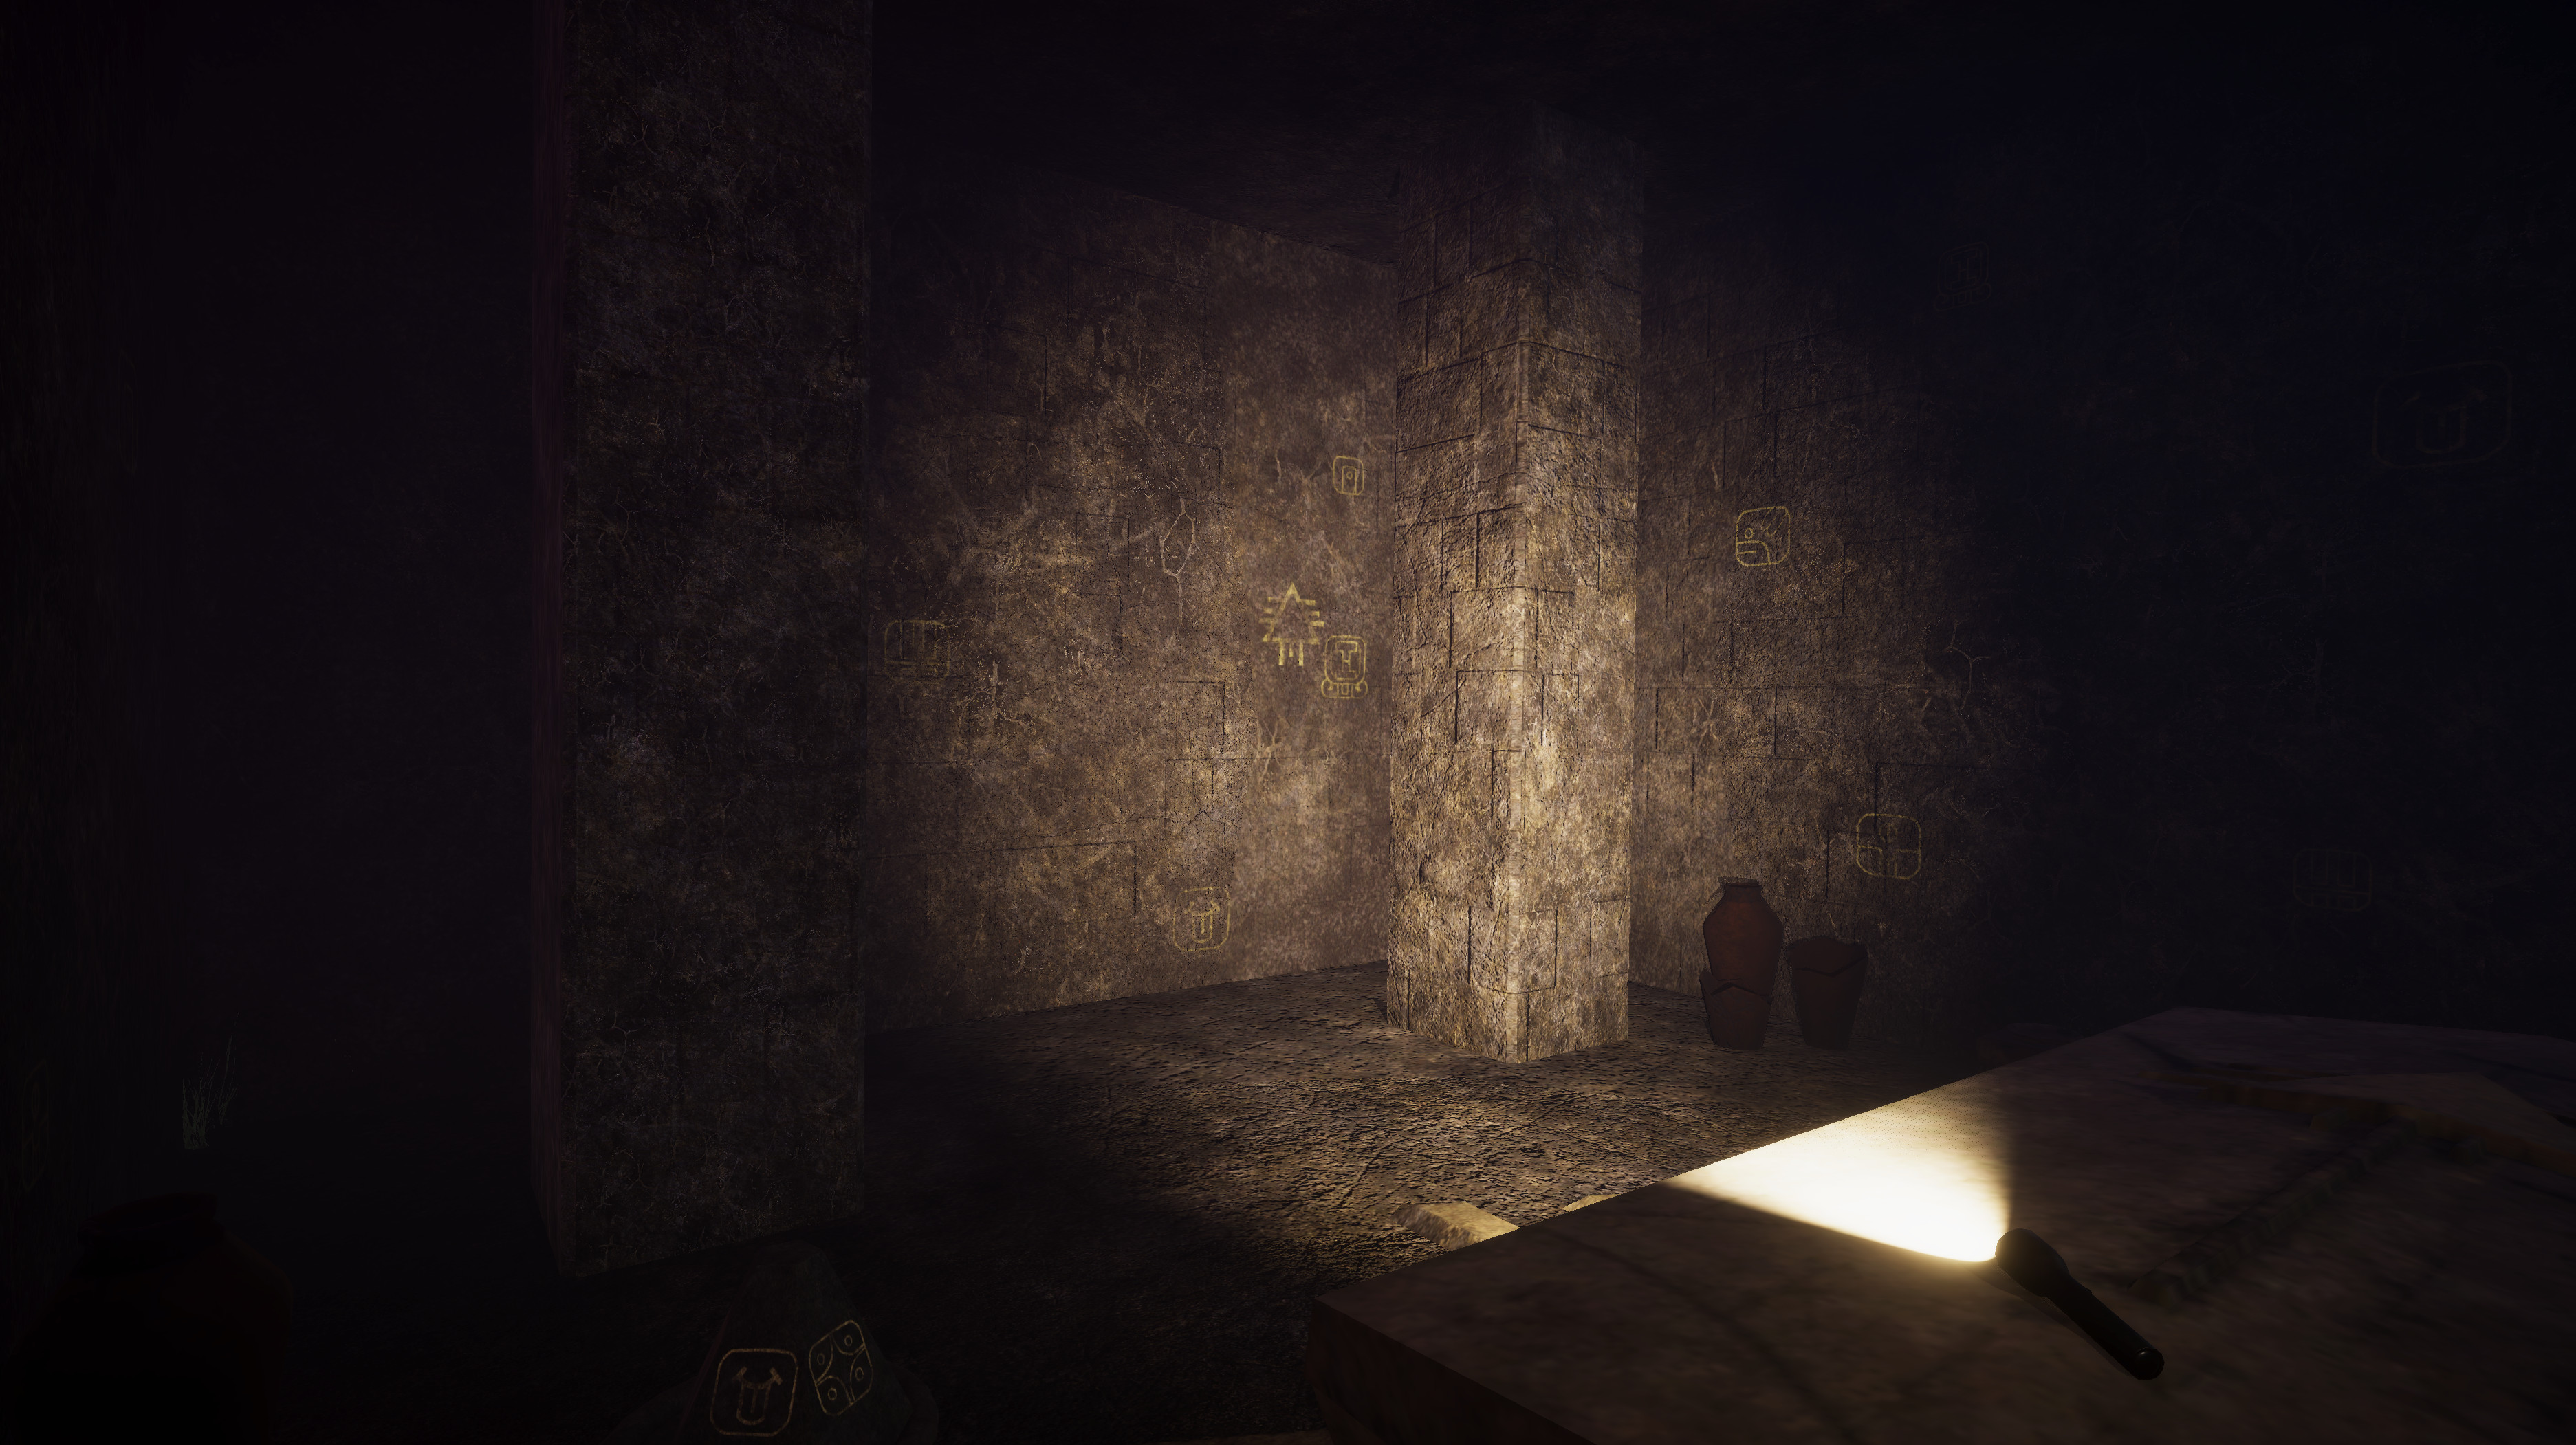 Inside the mausoleum.